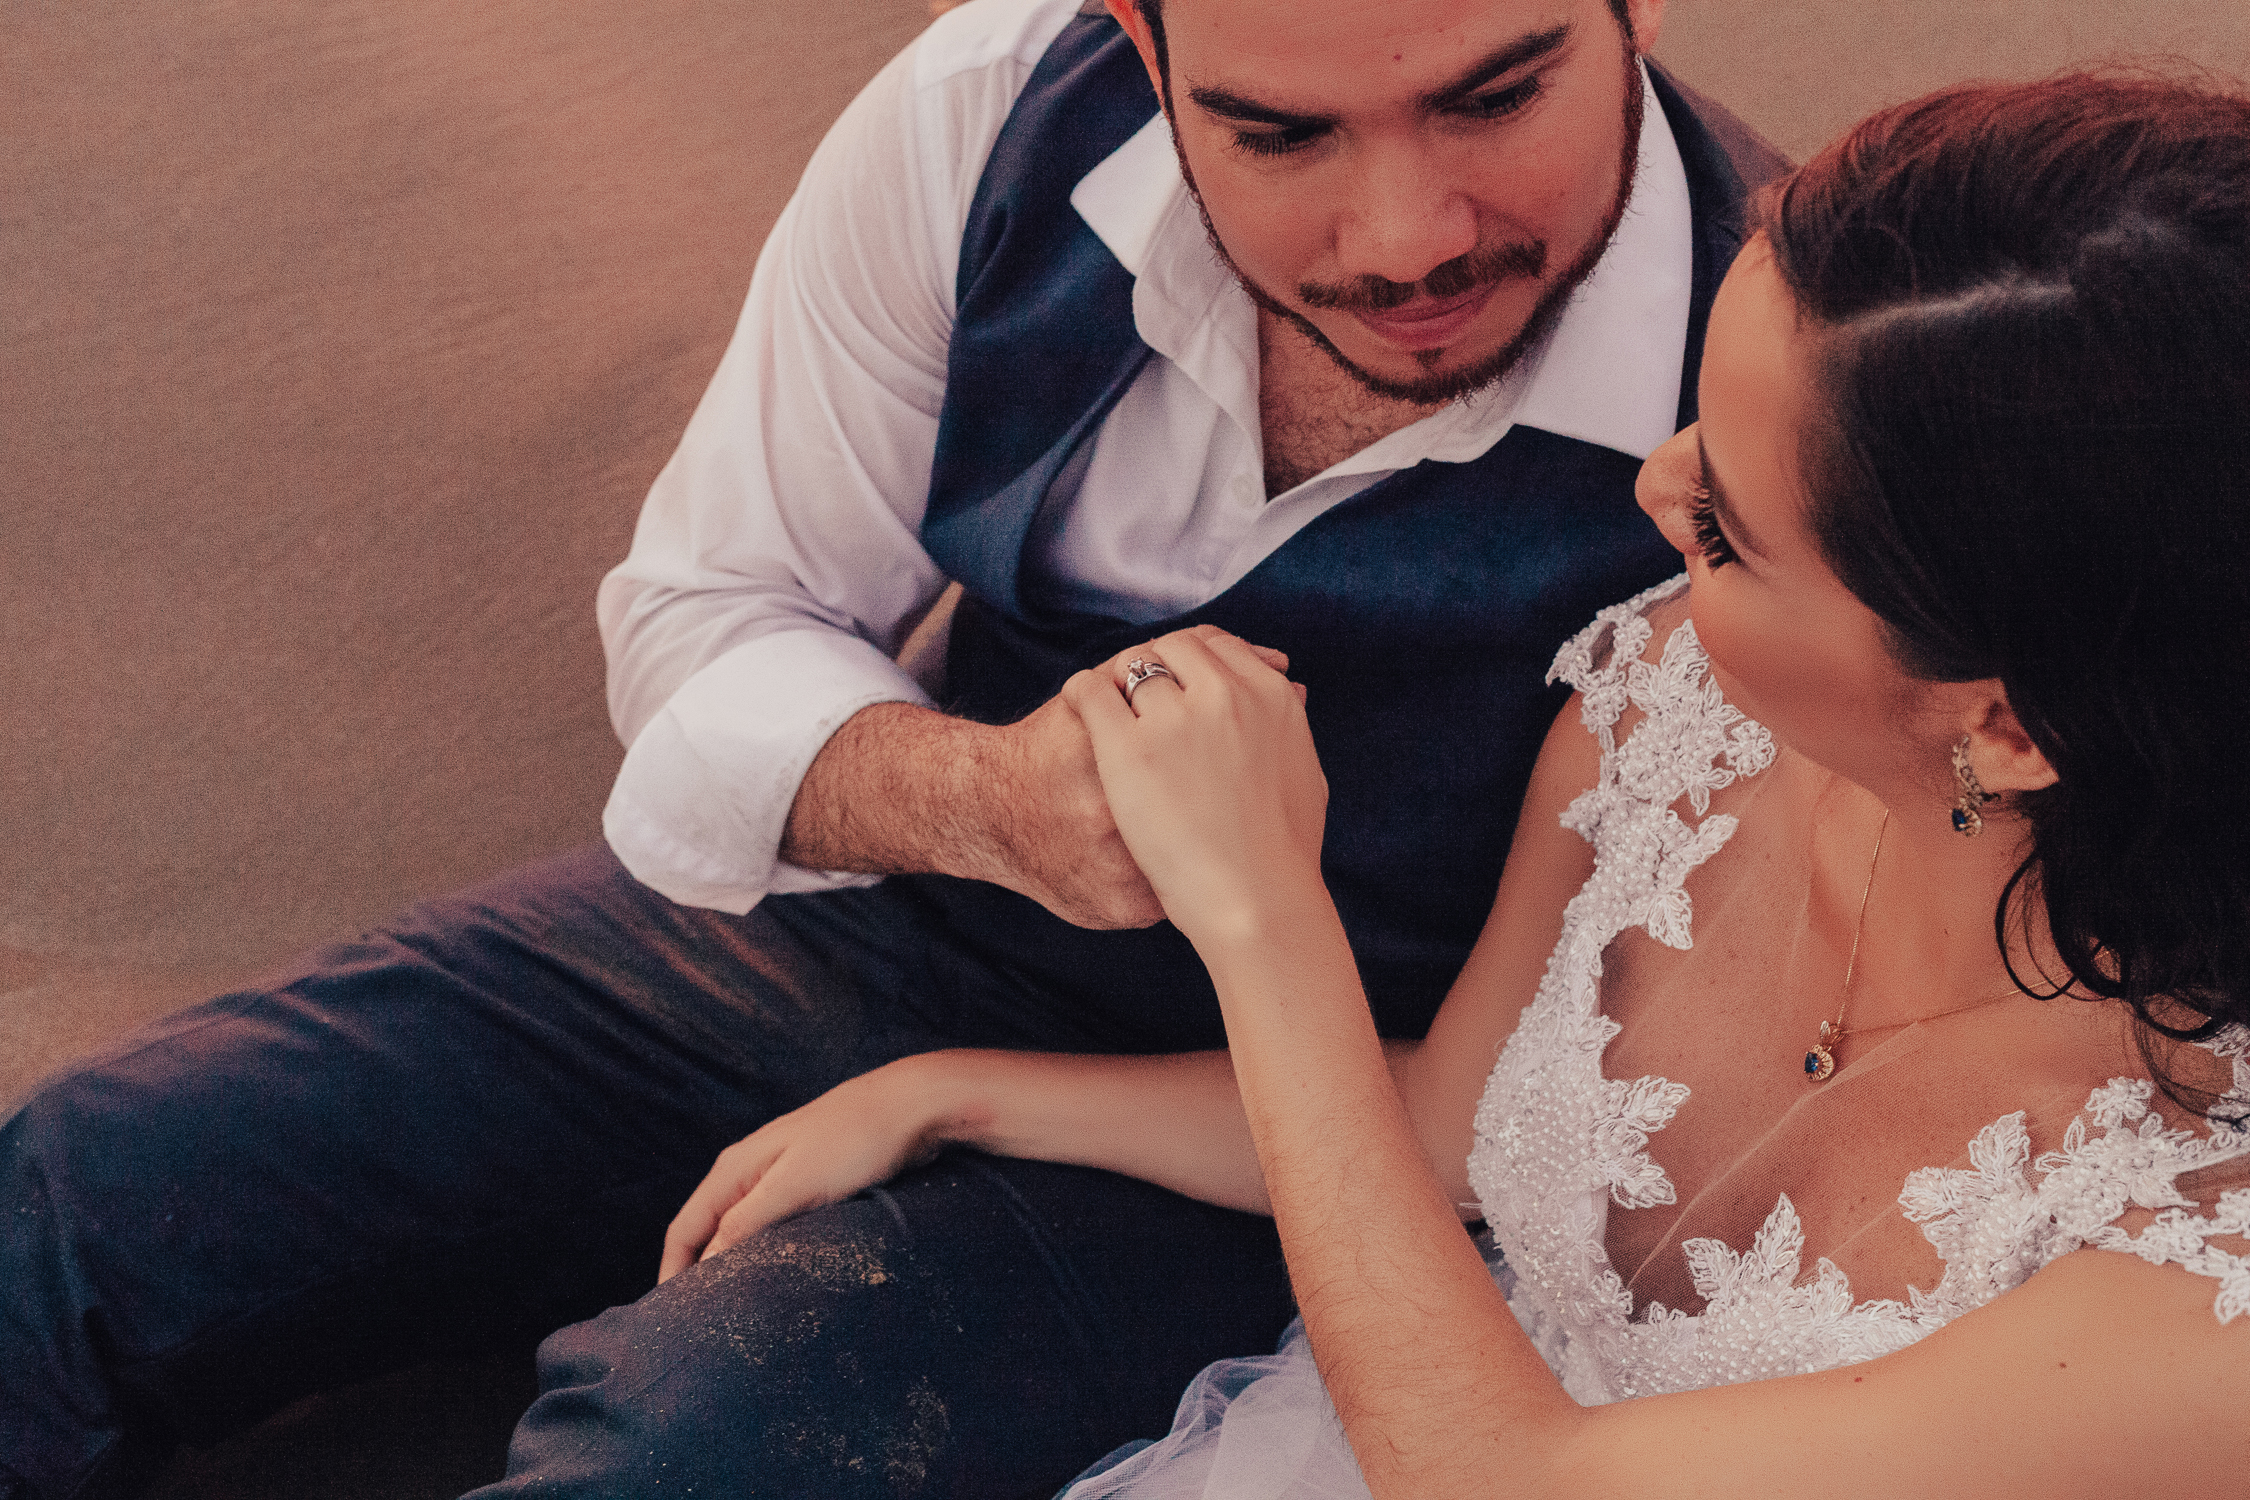 Michelle-Agurto-Fotografia-Bodas-Ecuador-Destination-Wedding-Photographer-Gabriela-Gabriel-37.JPG